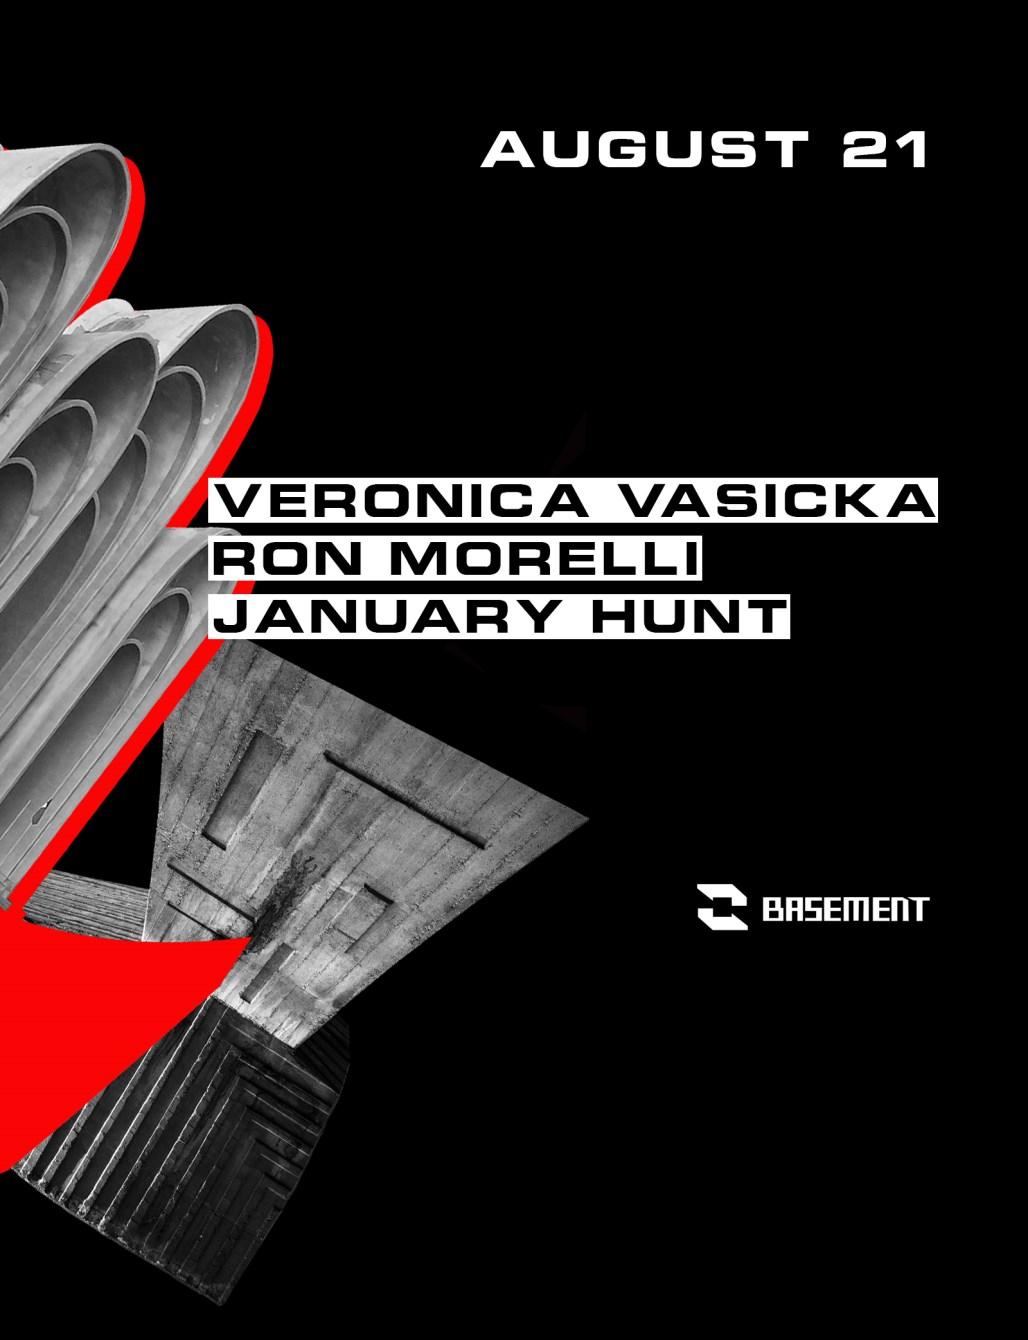 Veronica Vasicka / Ron Morelli / January Hunt - Flyer front